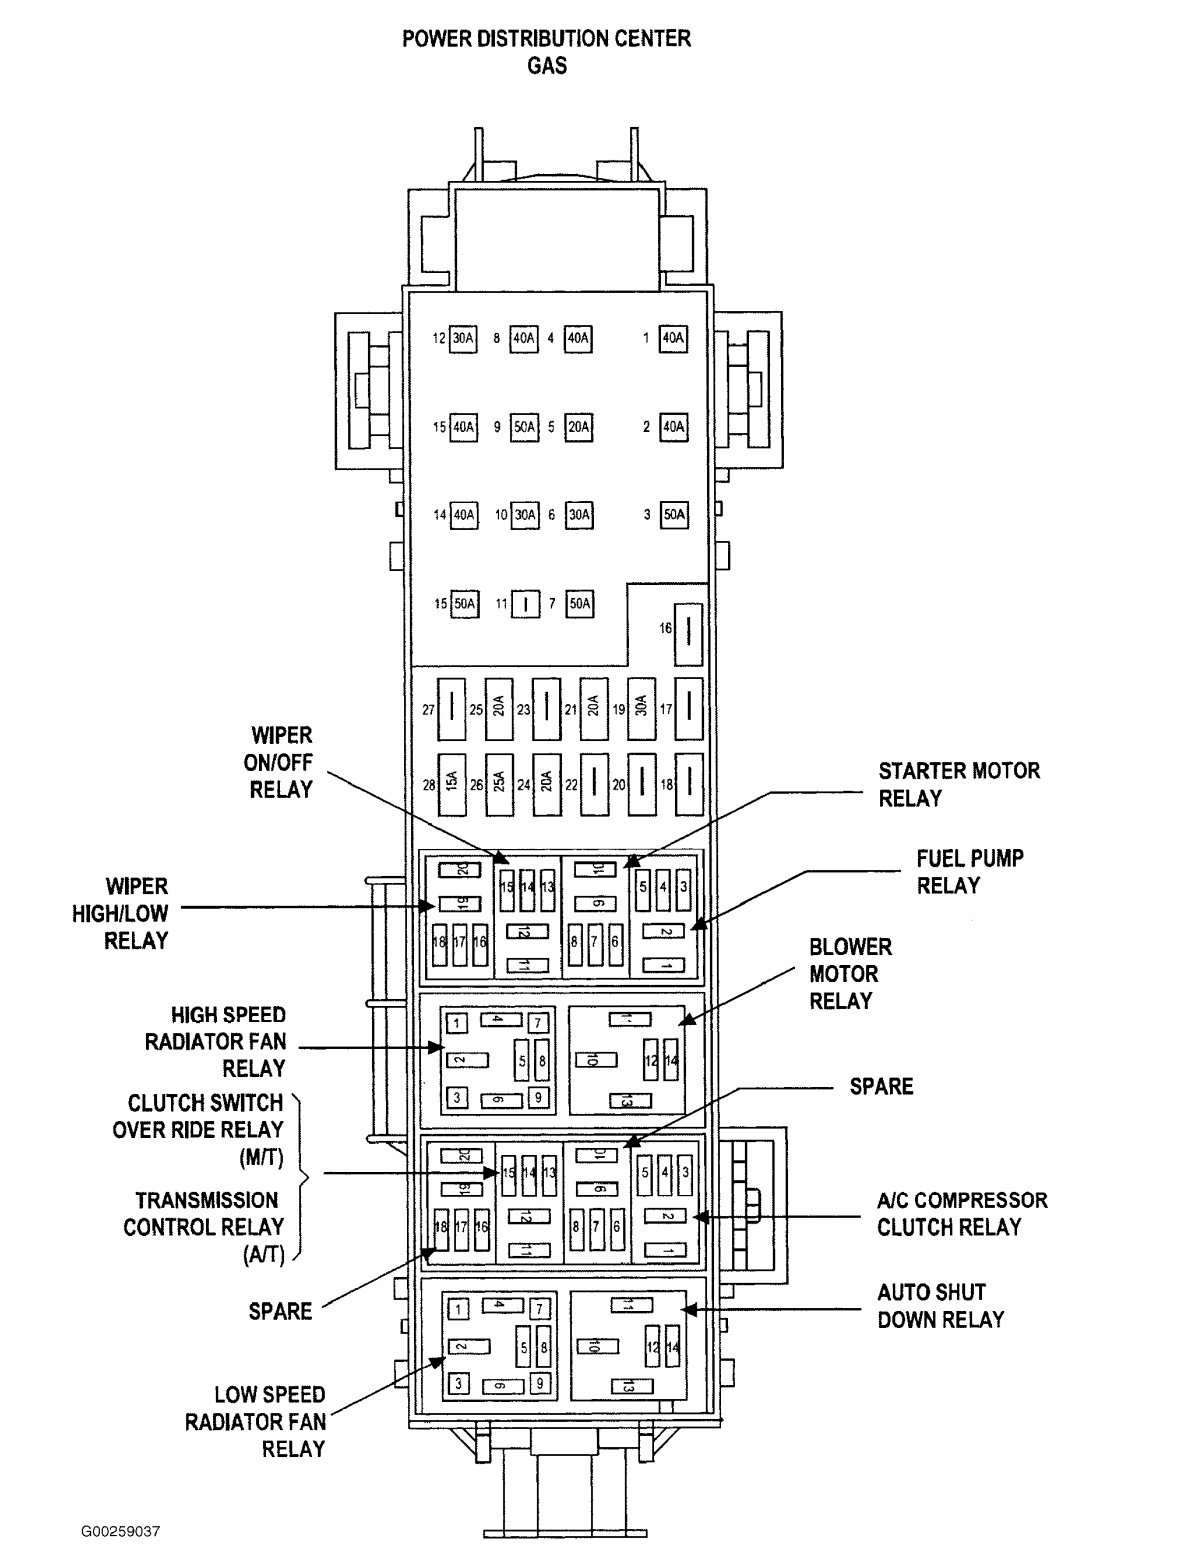 1995 Gmc Sierra Fuse Diagram